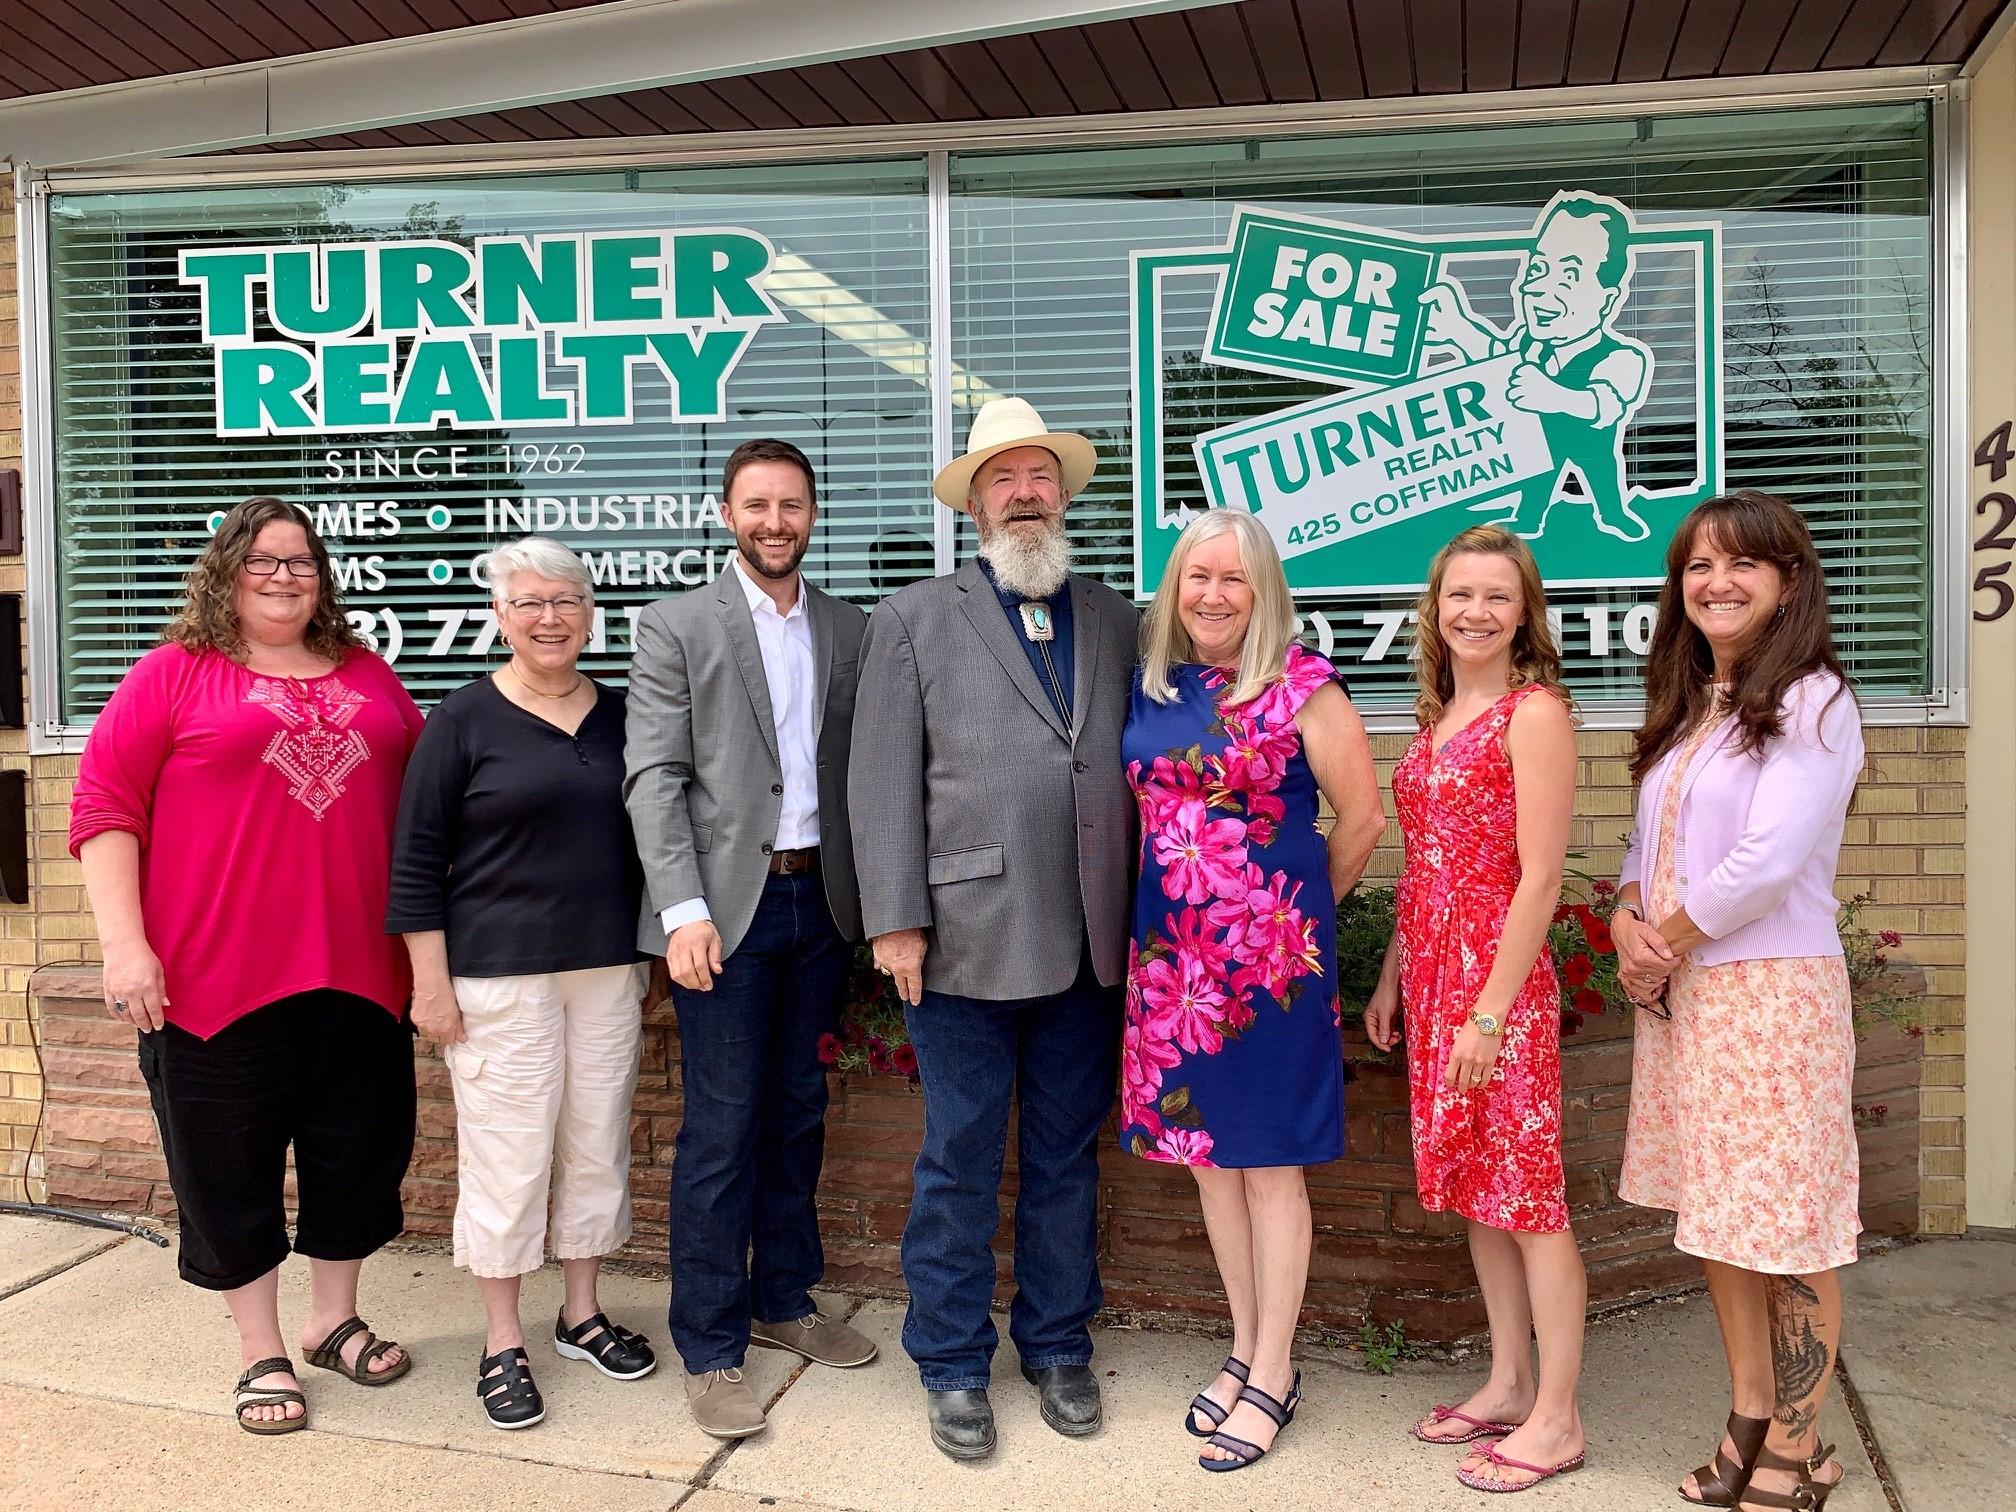 Turner Realty is based in Longmont